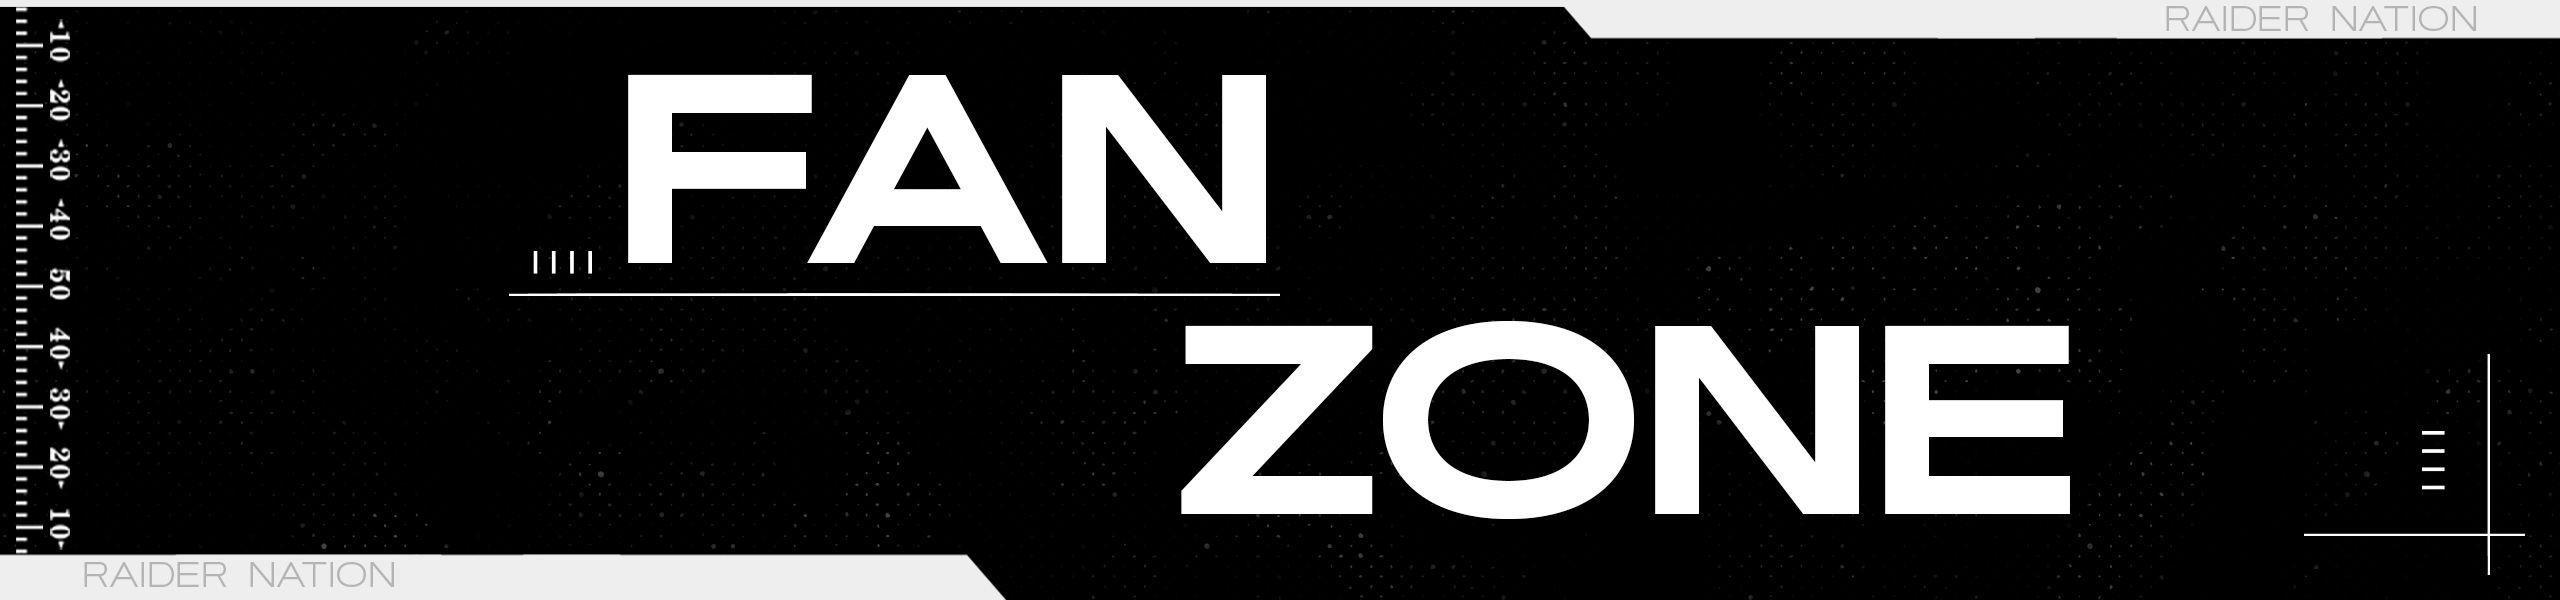 fanzone-page-header-053118-v4